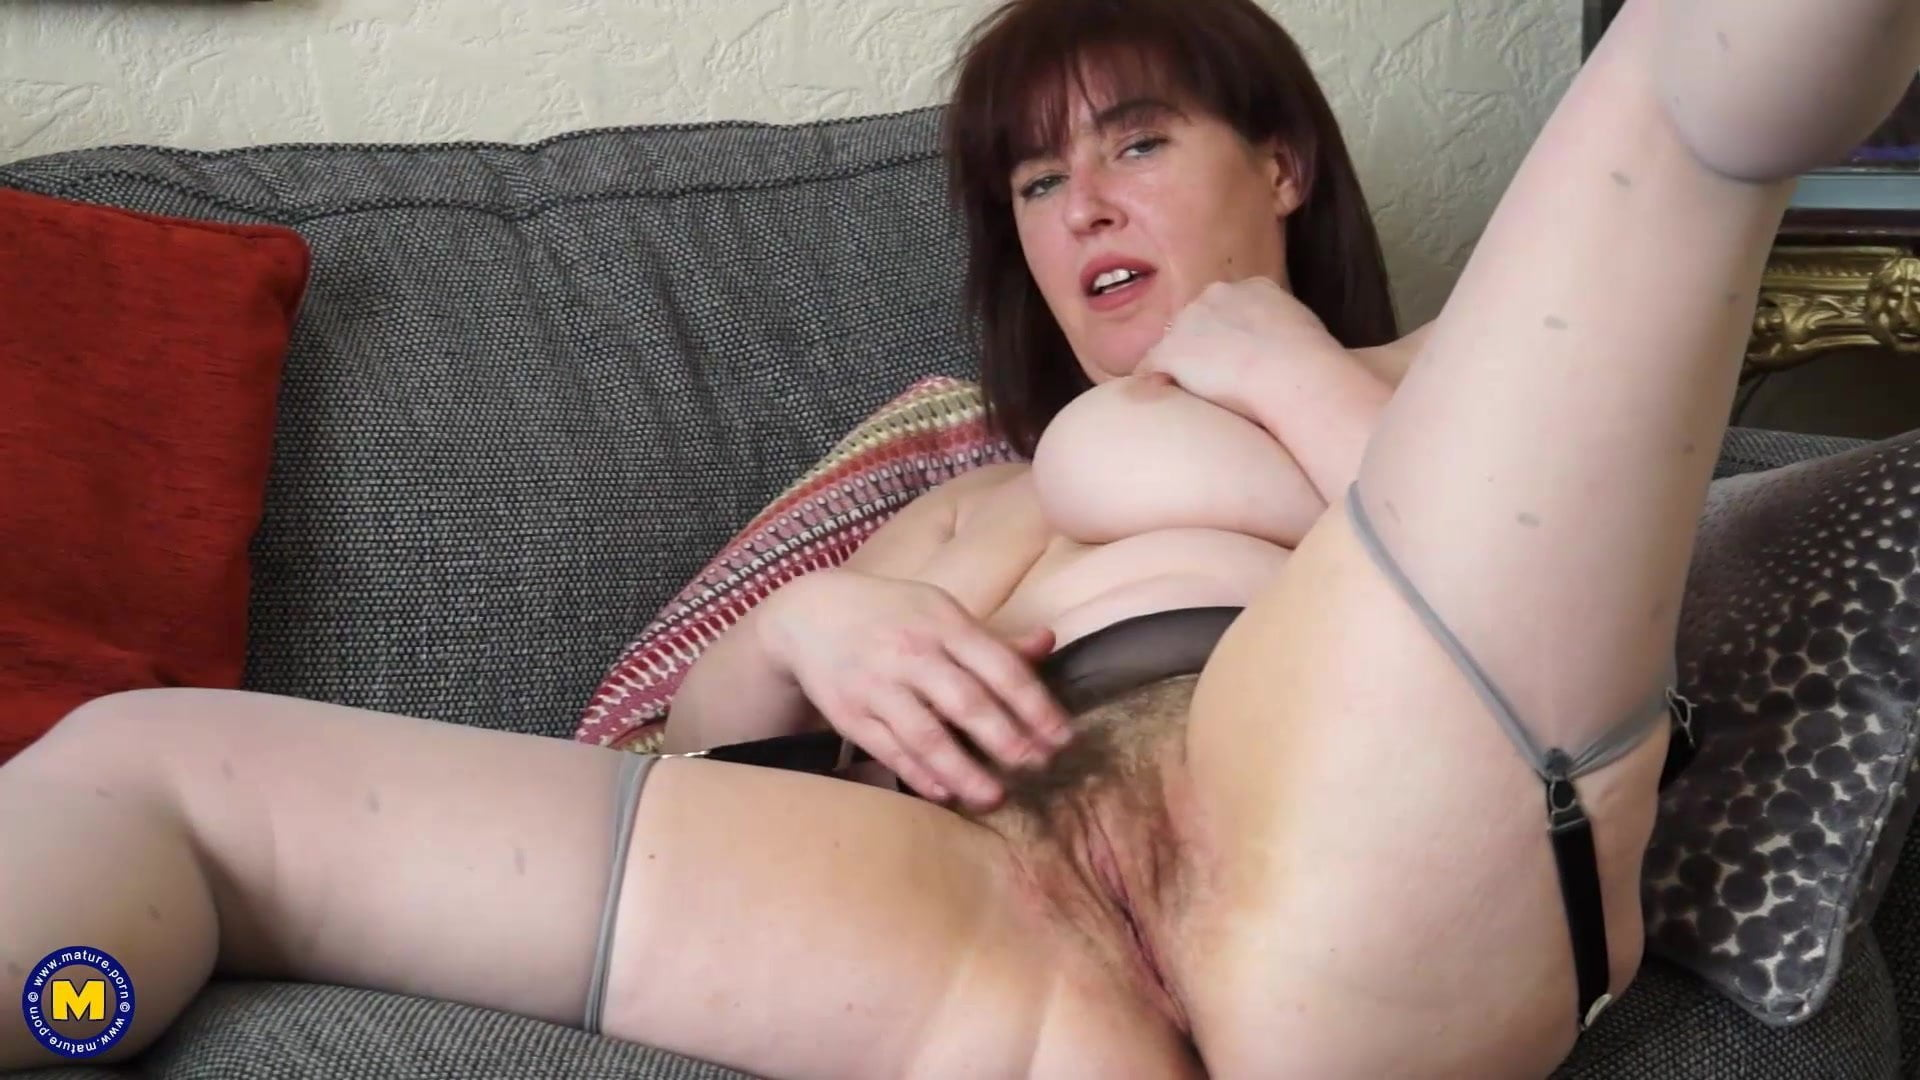 Dick mature ass sucks tight